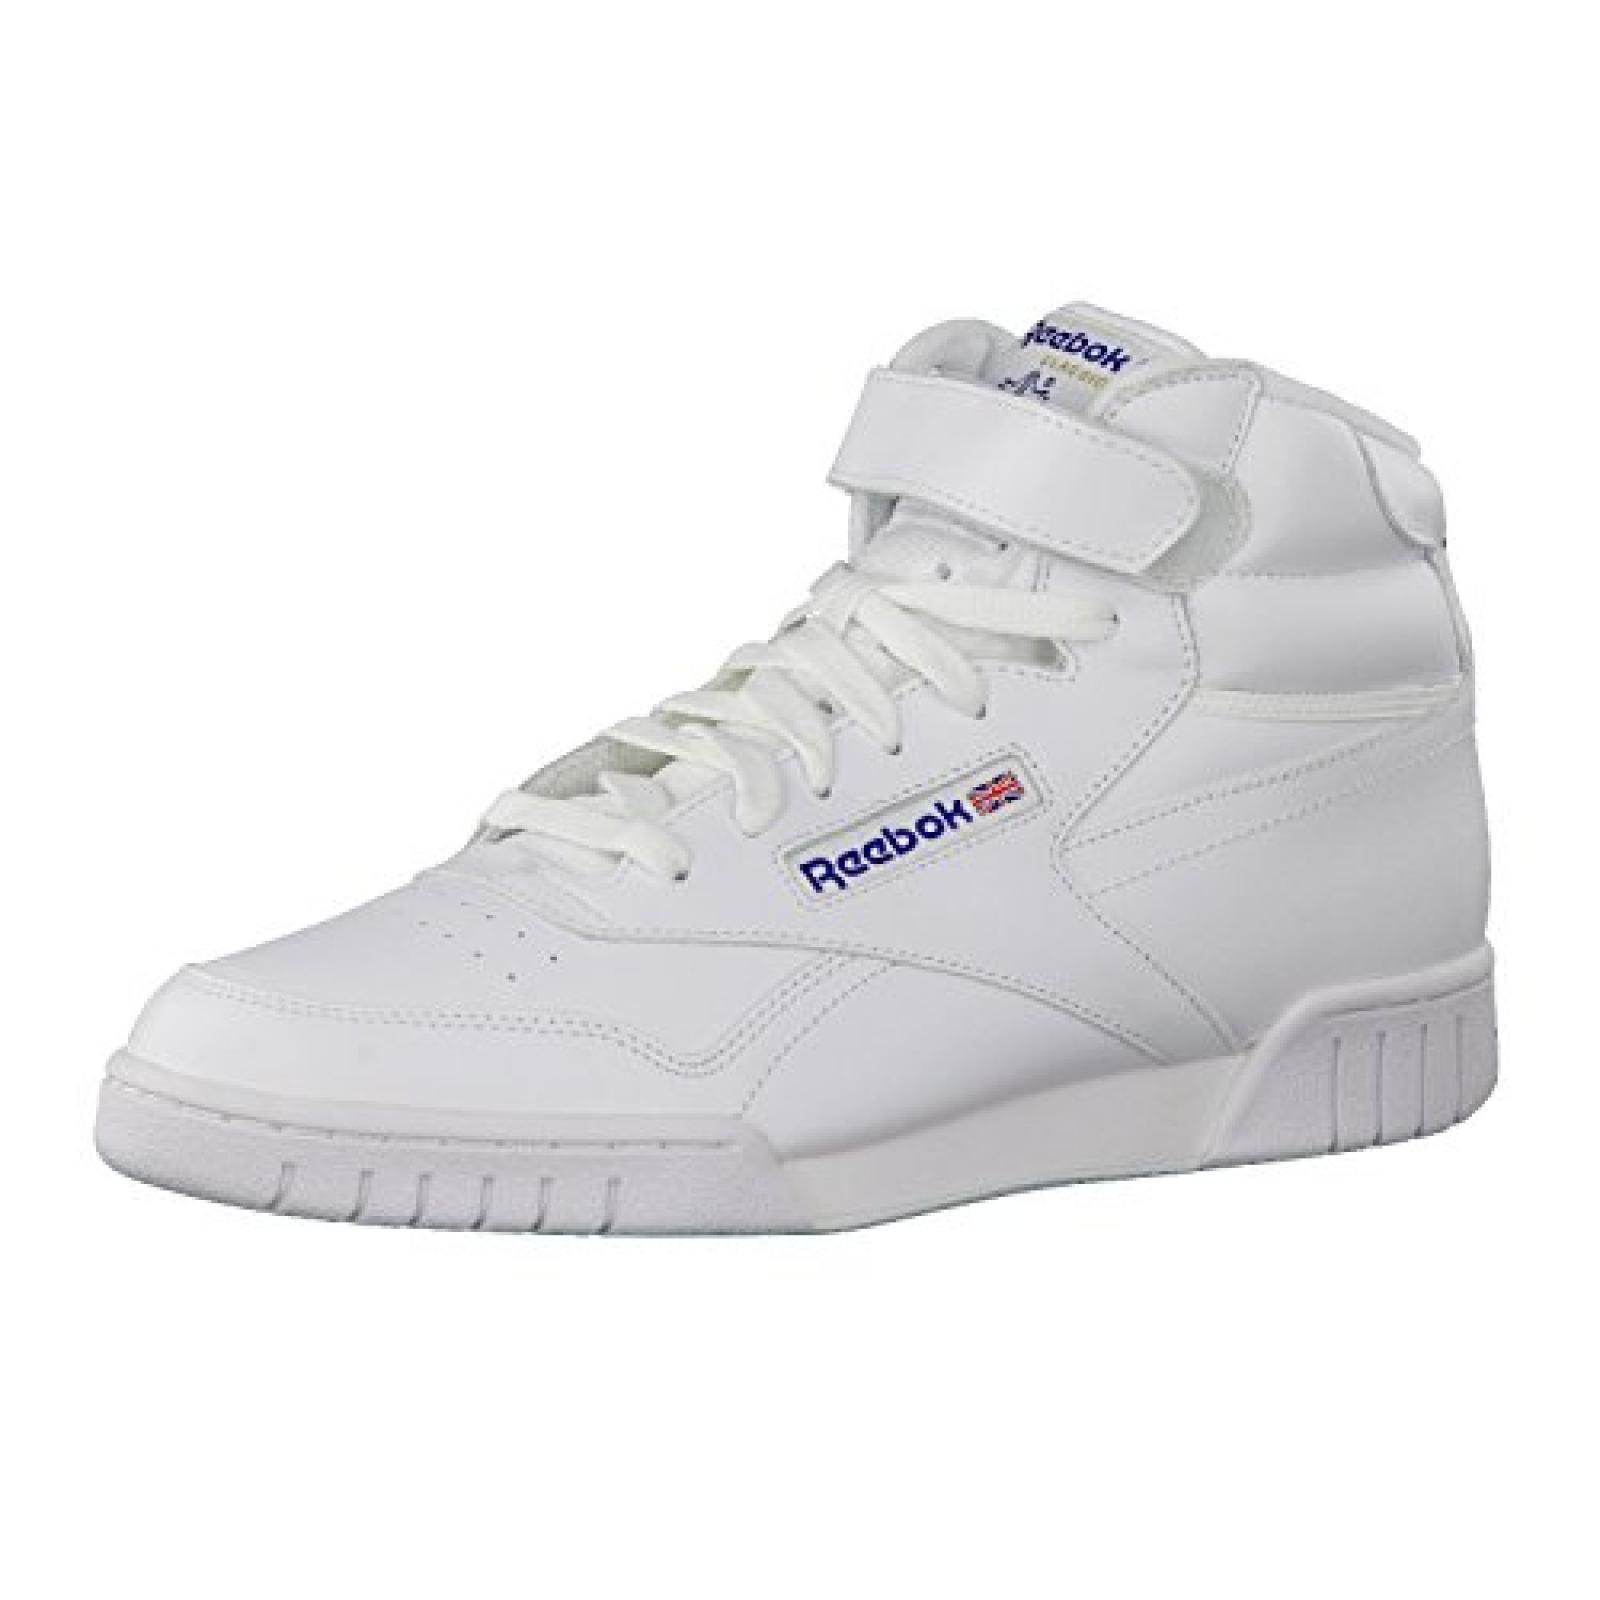 Reebok Ex-O-Fit Hi Unisex-Erwachsene Hohe Sneakers